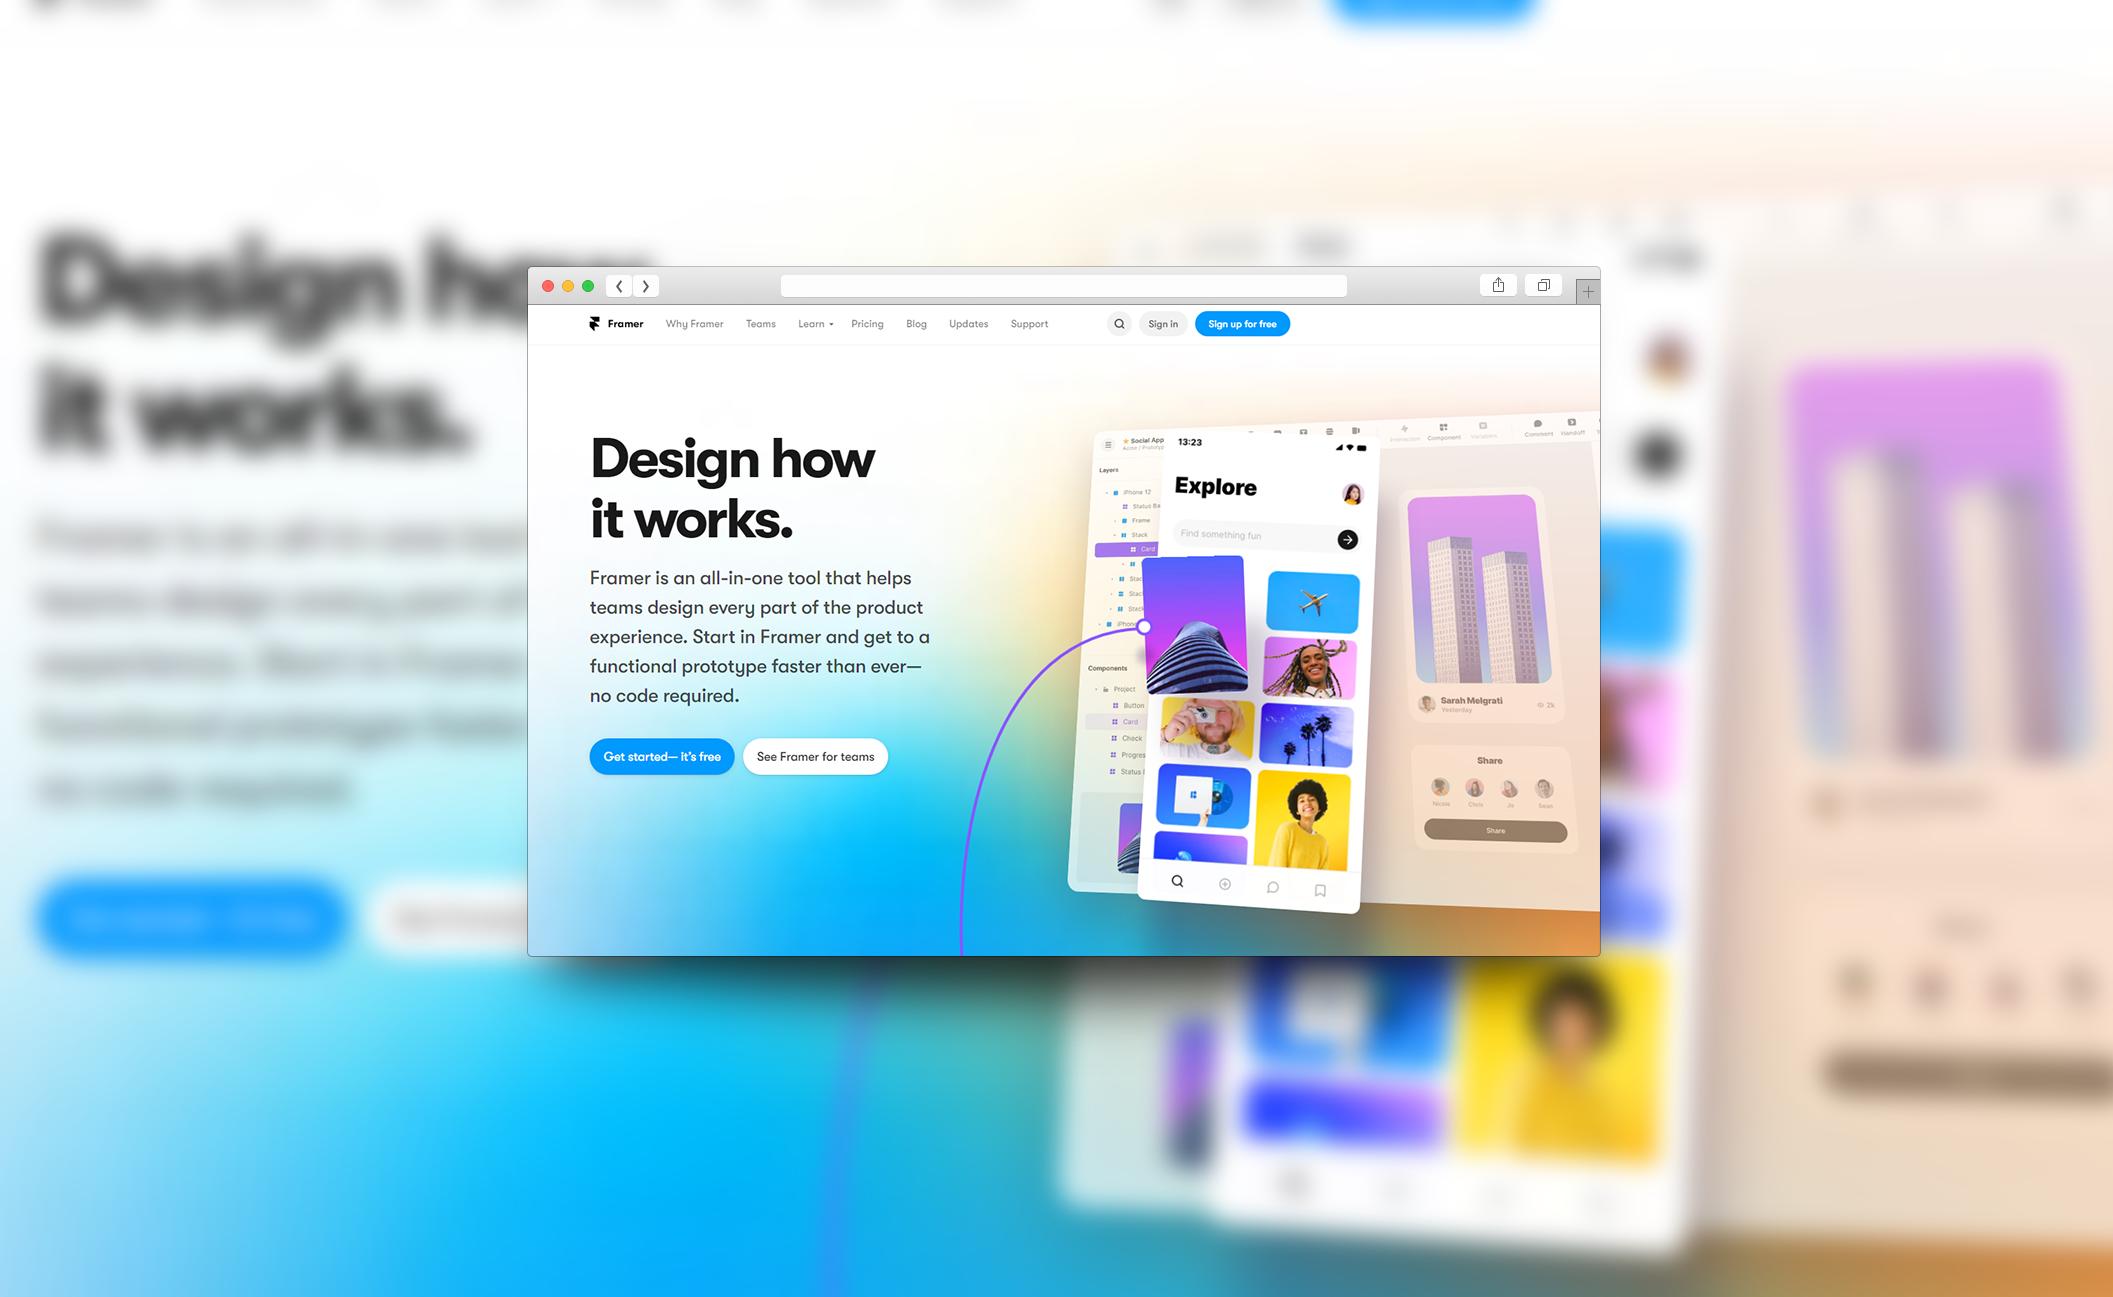 ui animation, tool, web development,saitis damzadeba